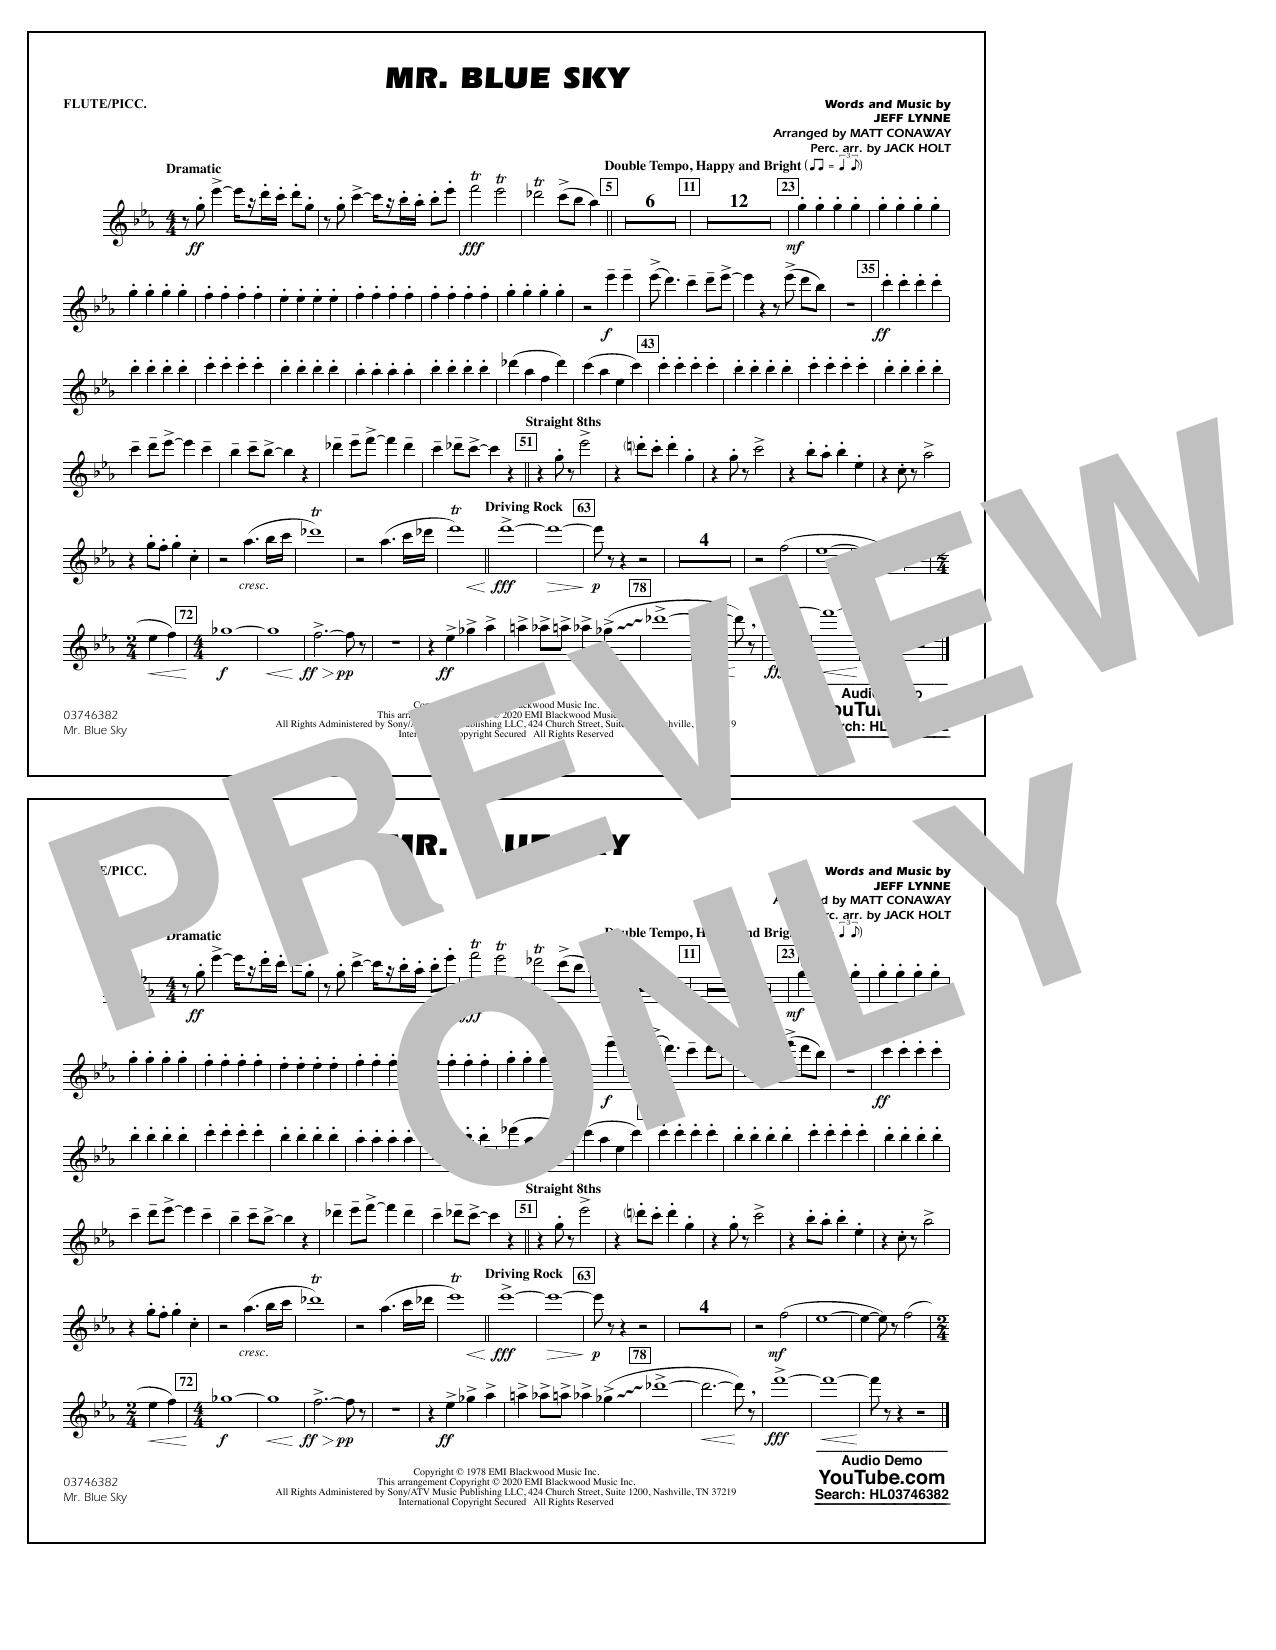 Mr. Blue Sky (arr. Matt Conaway) - Flute/Piccolo Sheet Music